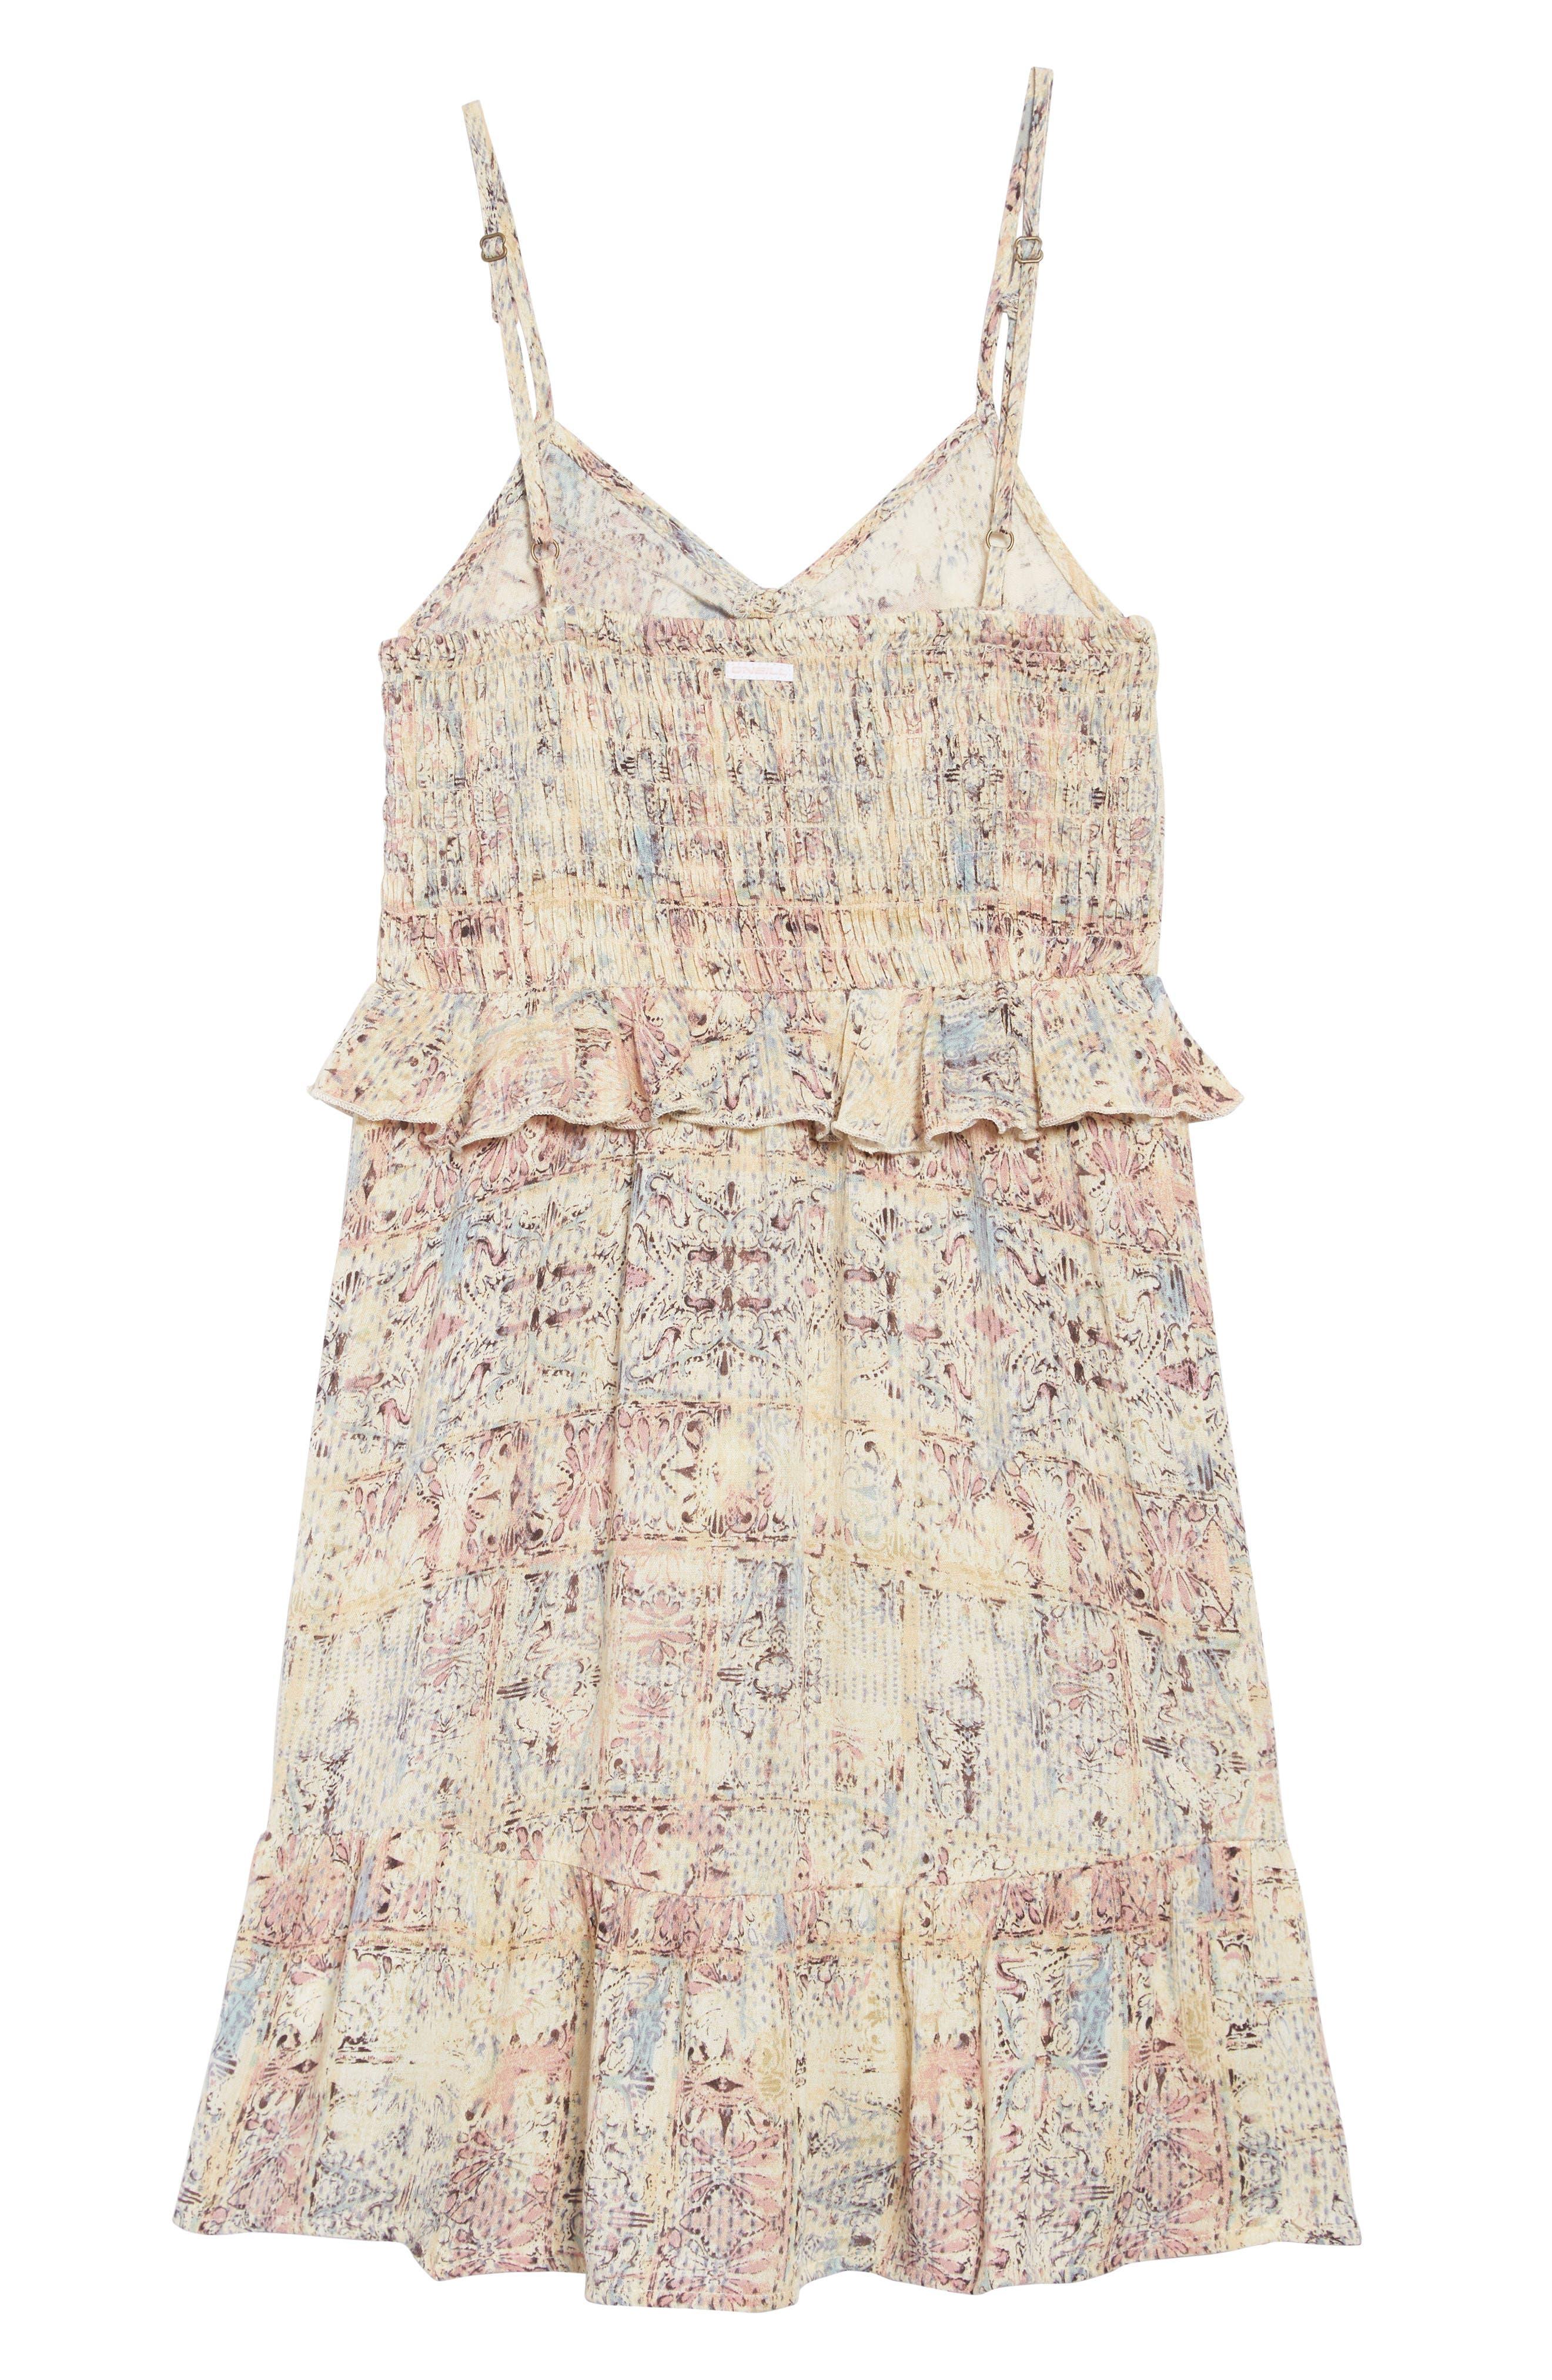 O'NEILL, Lithia Peplum High/Low Dress, Alternate thumbnail 4, color, 994